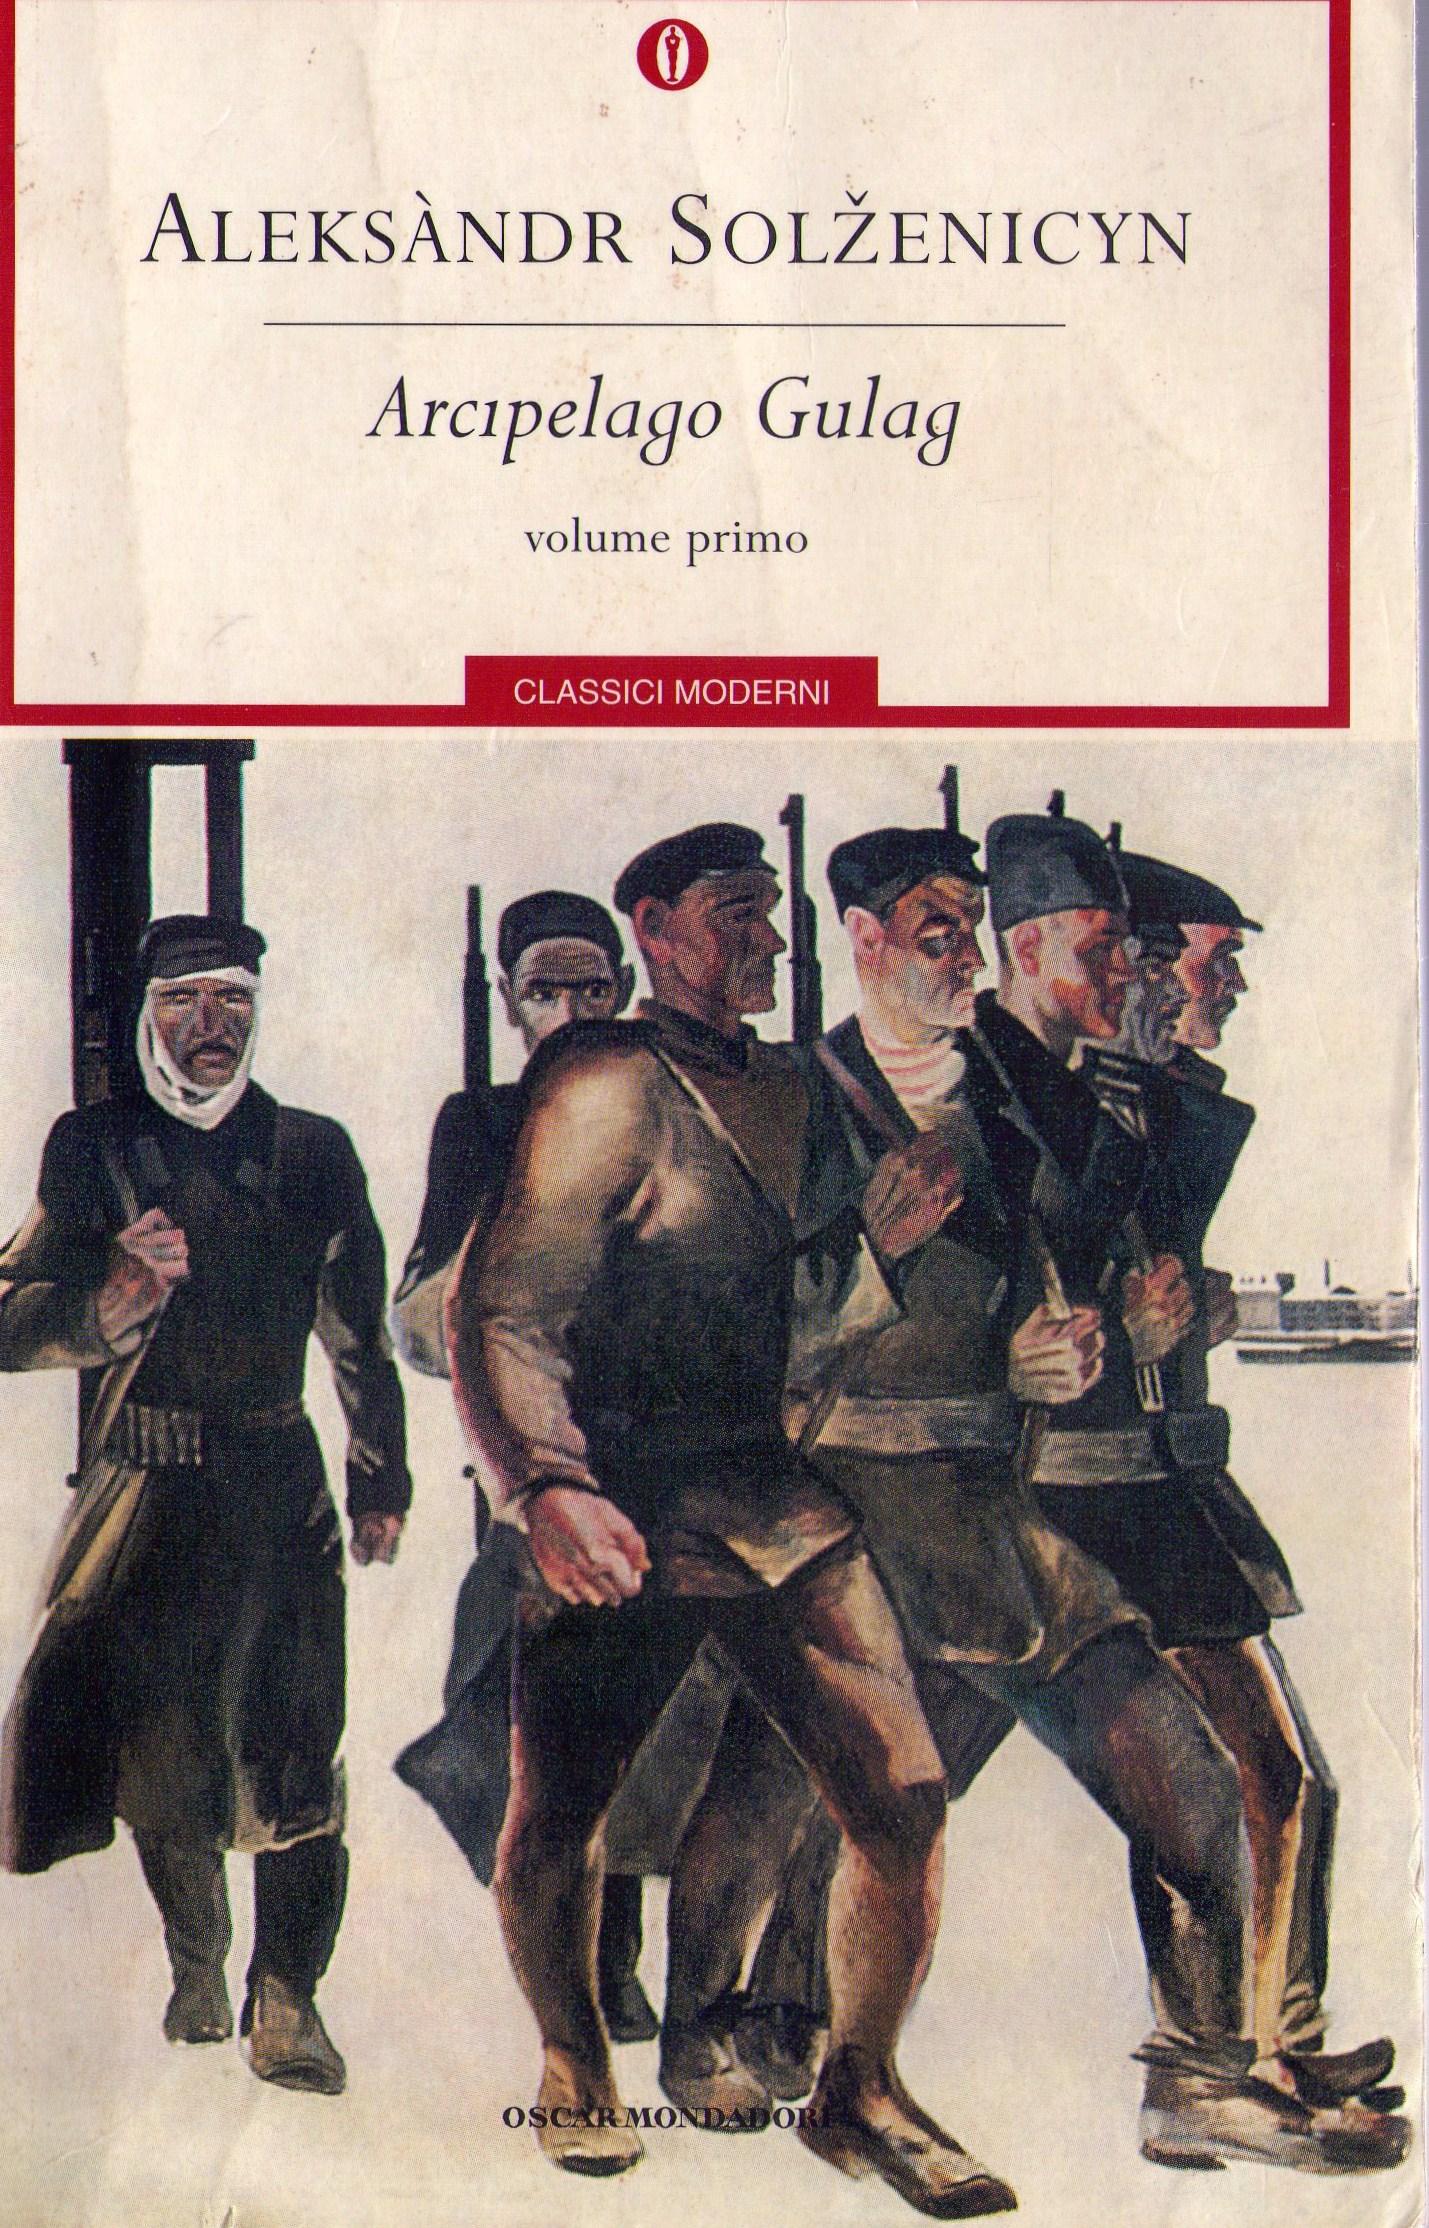 Arcipelago Gulag, 1918-1956